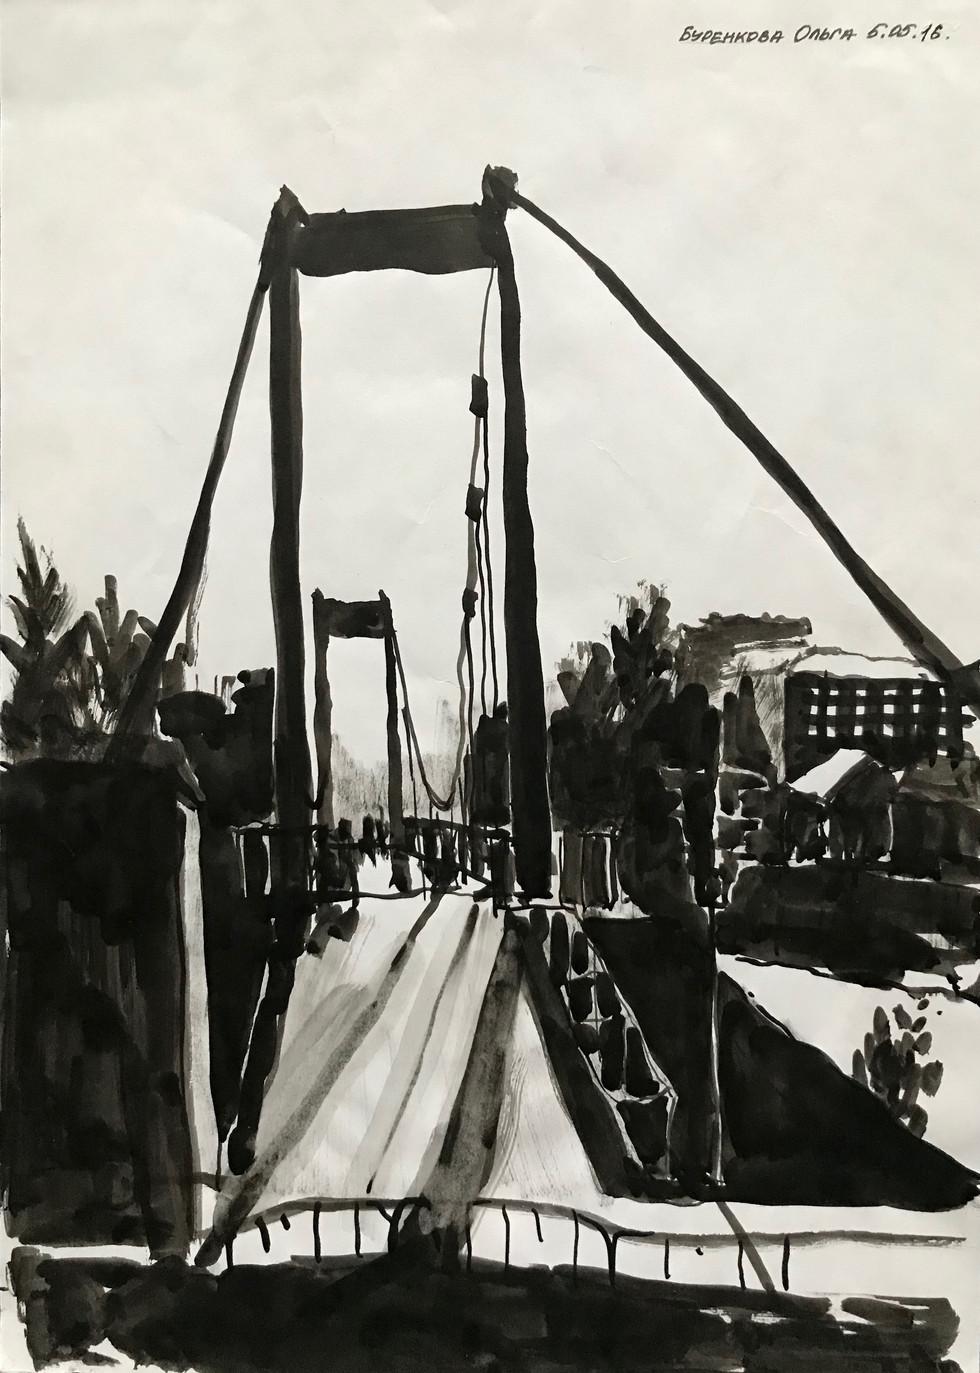 Bridge, Penza, View 2, 8.5x11_, 2016.jpe